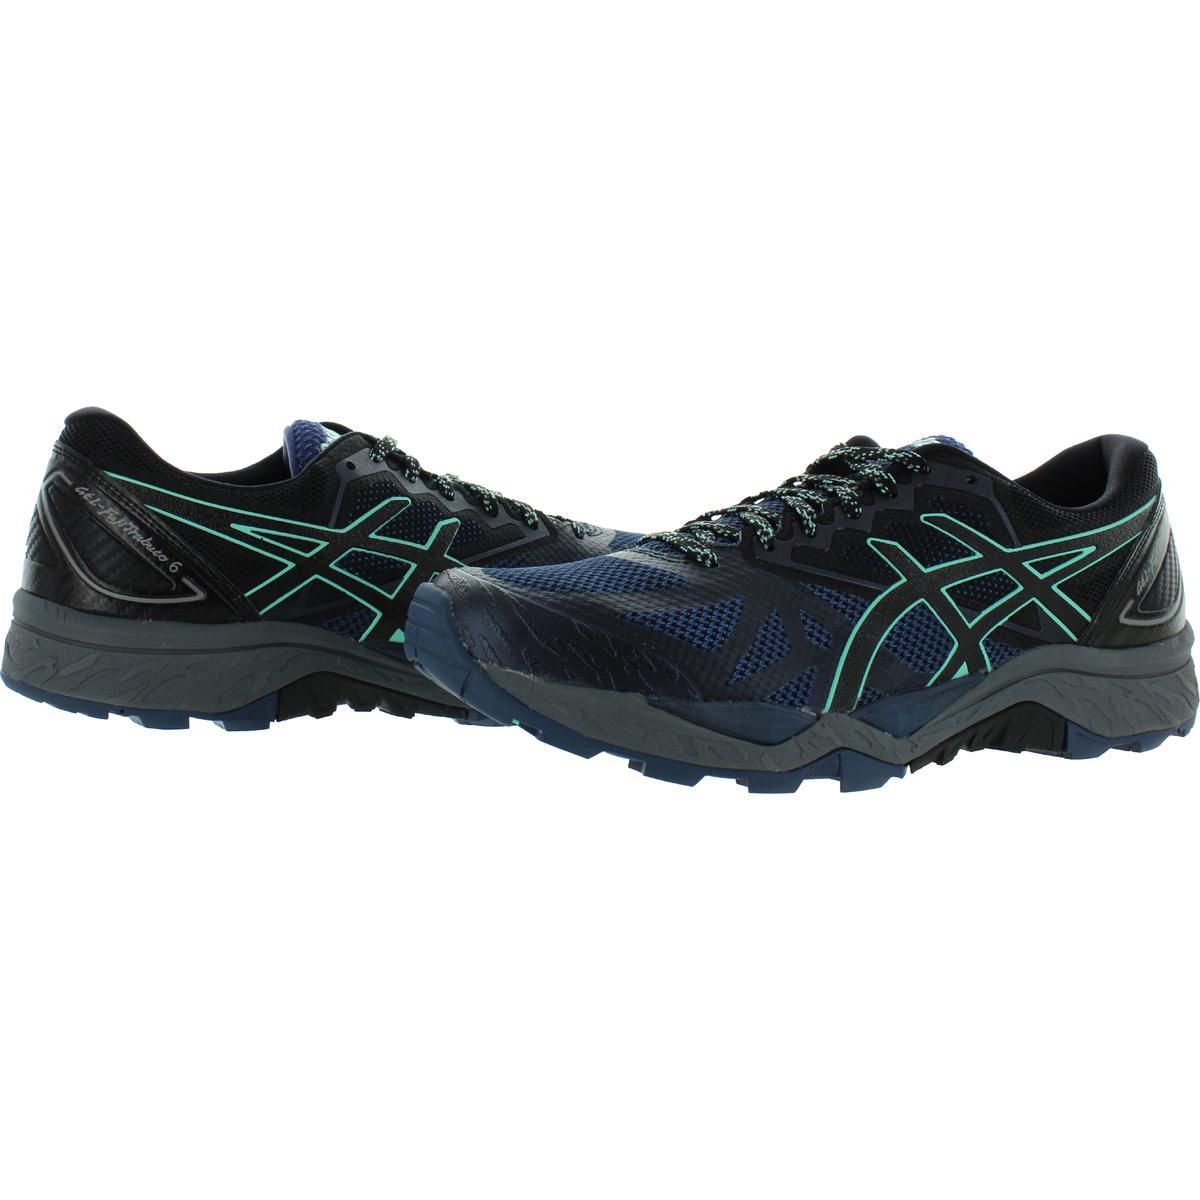 Asics-Womens-Gel-Fuji-Trabuco-6-Athletic-Running-Shoes-Sneakers-BHFO-7368 thumbnail 6